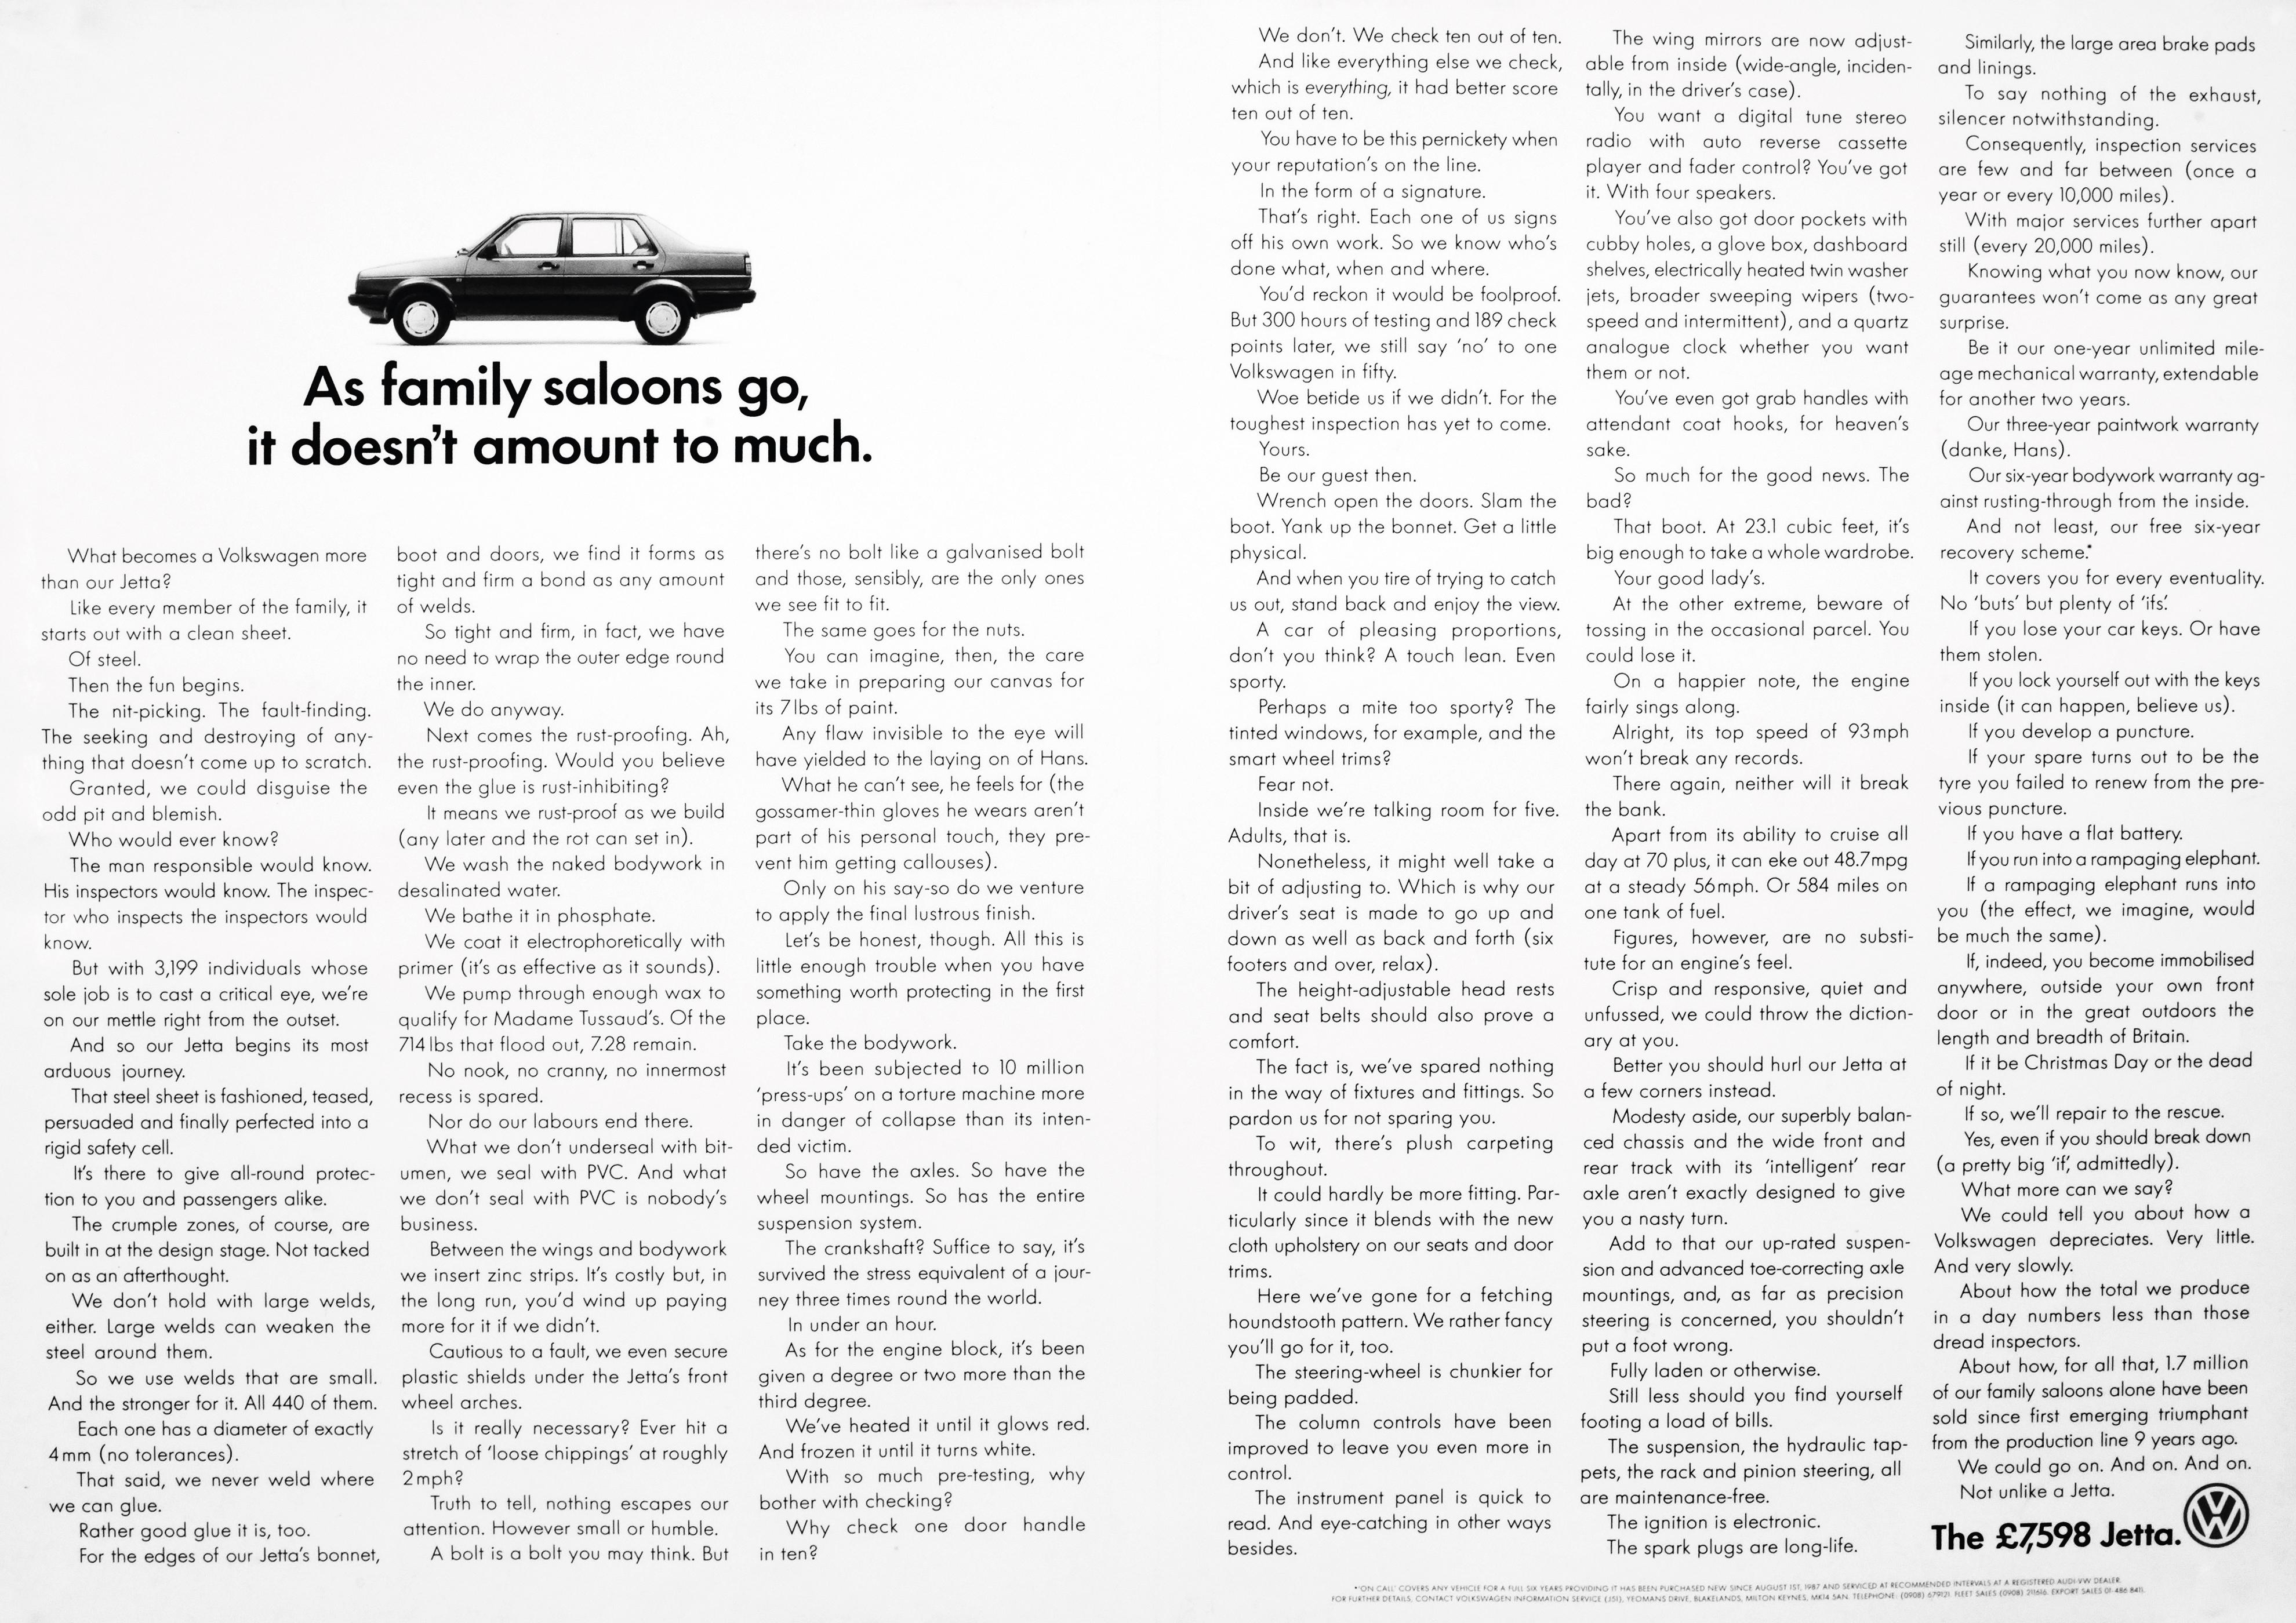 'As Family Saloons' Volkswagen, Mark Reddy, DDB-01